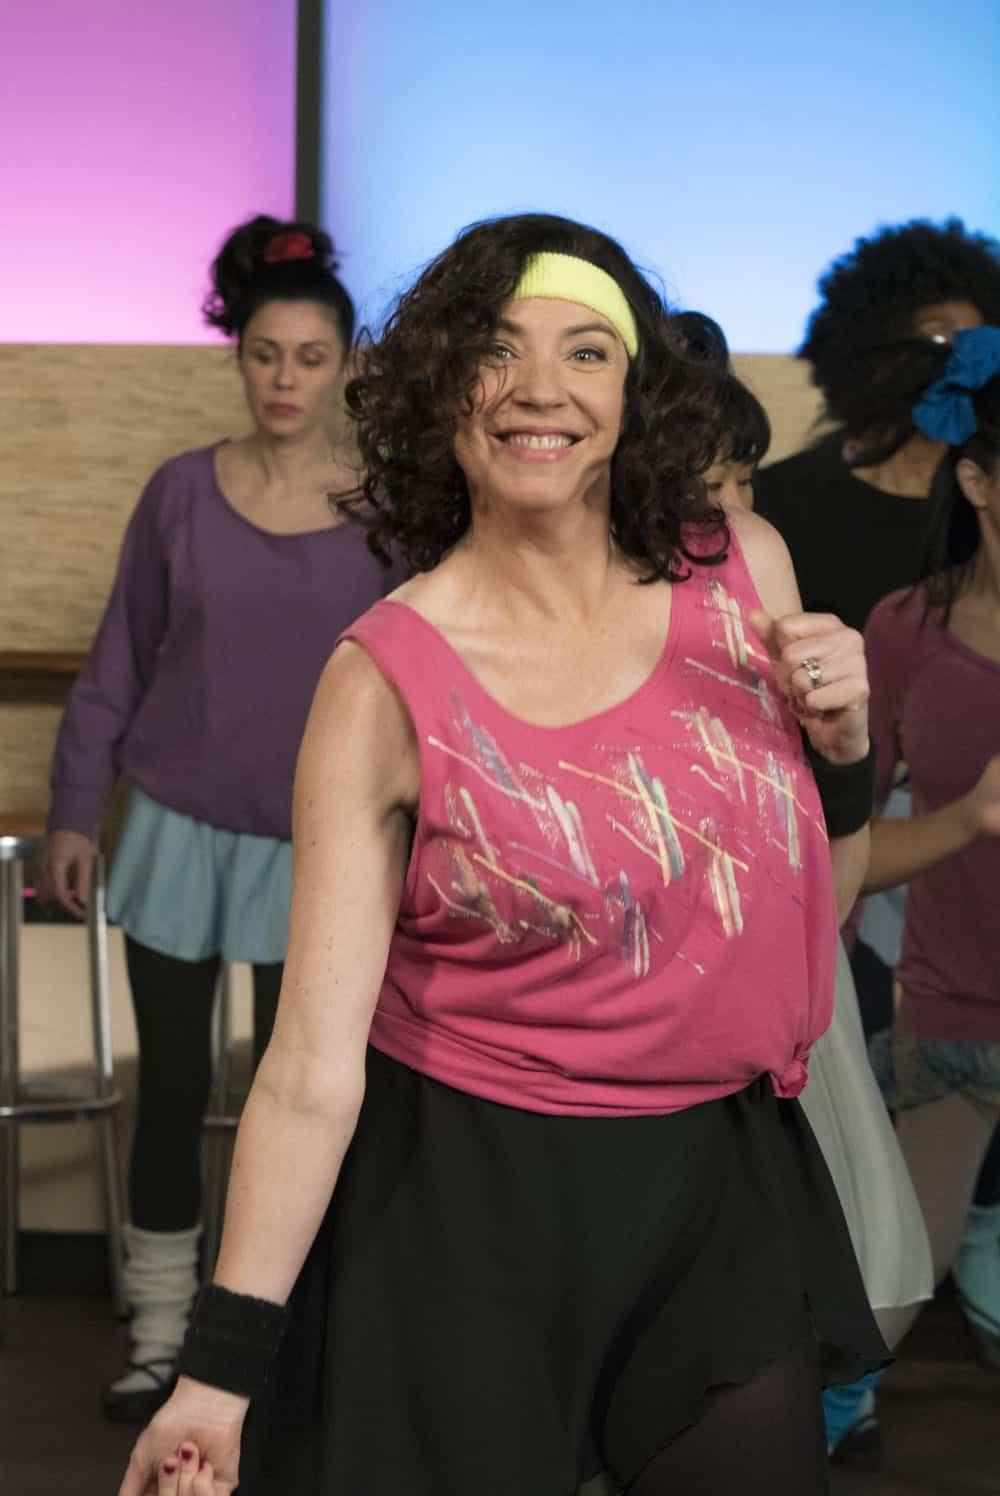 The Goldbergs Episode 19 Season 5 Flashy Little Flashdancer 14